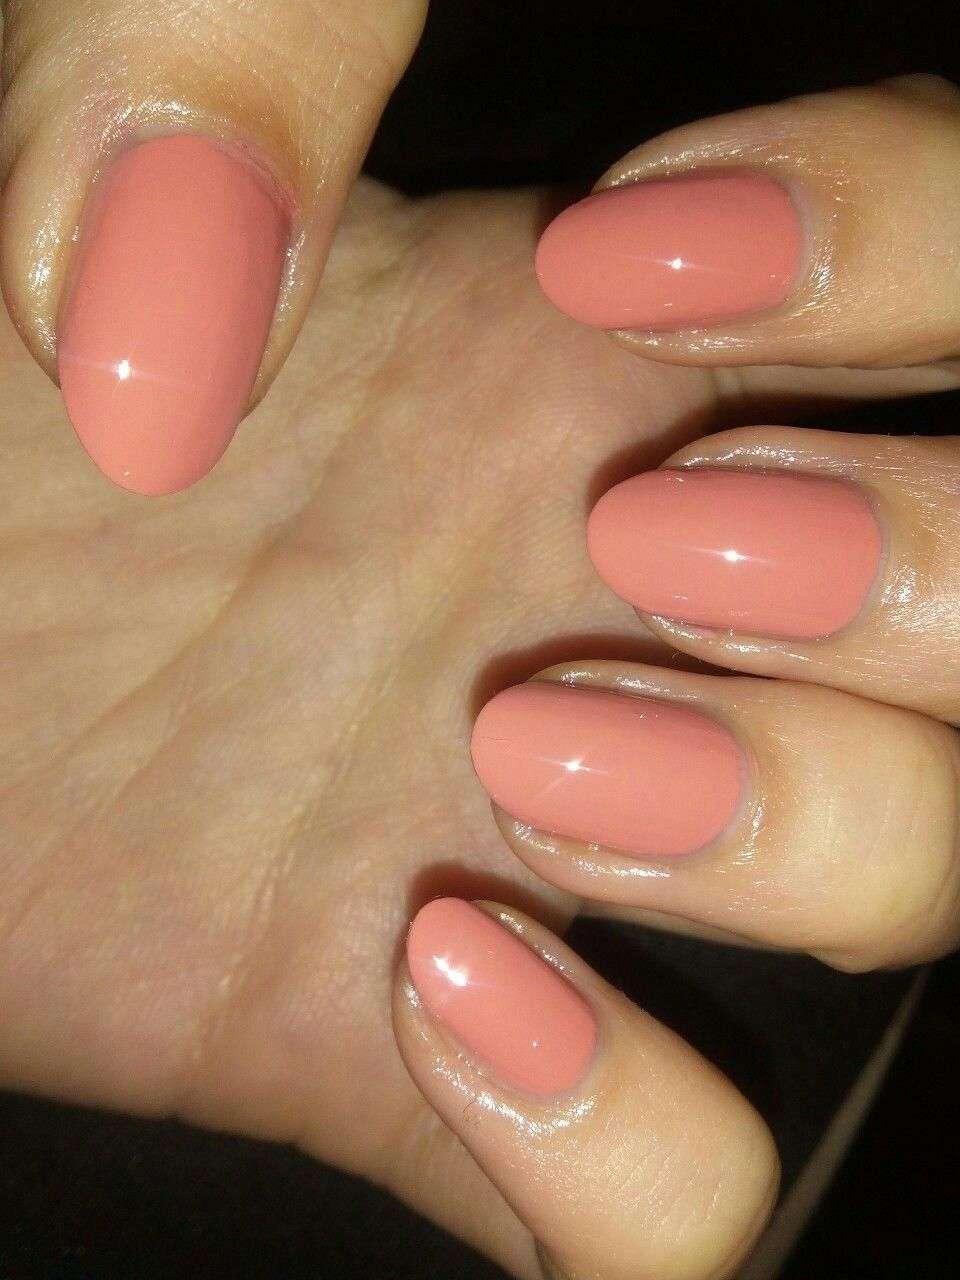 nail shapes squoval Glitter almondshapednails Acrylic